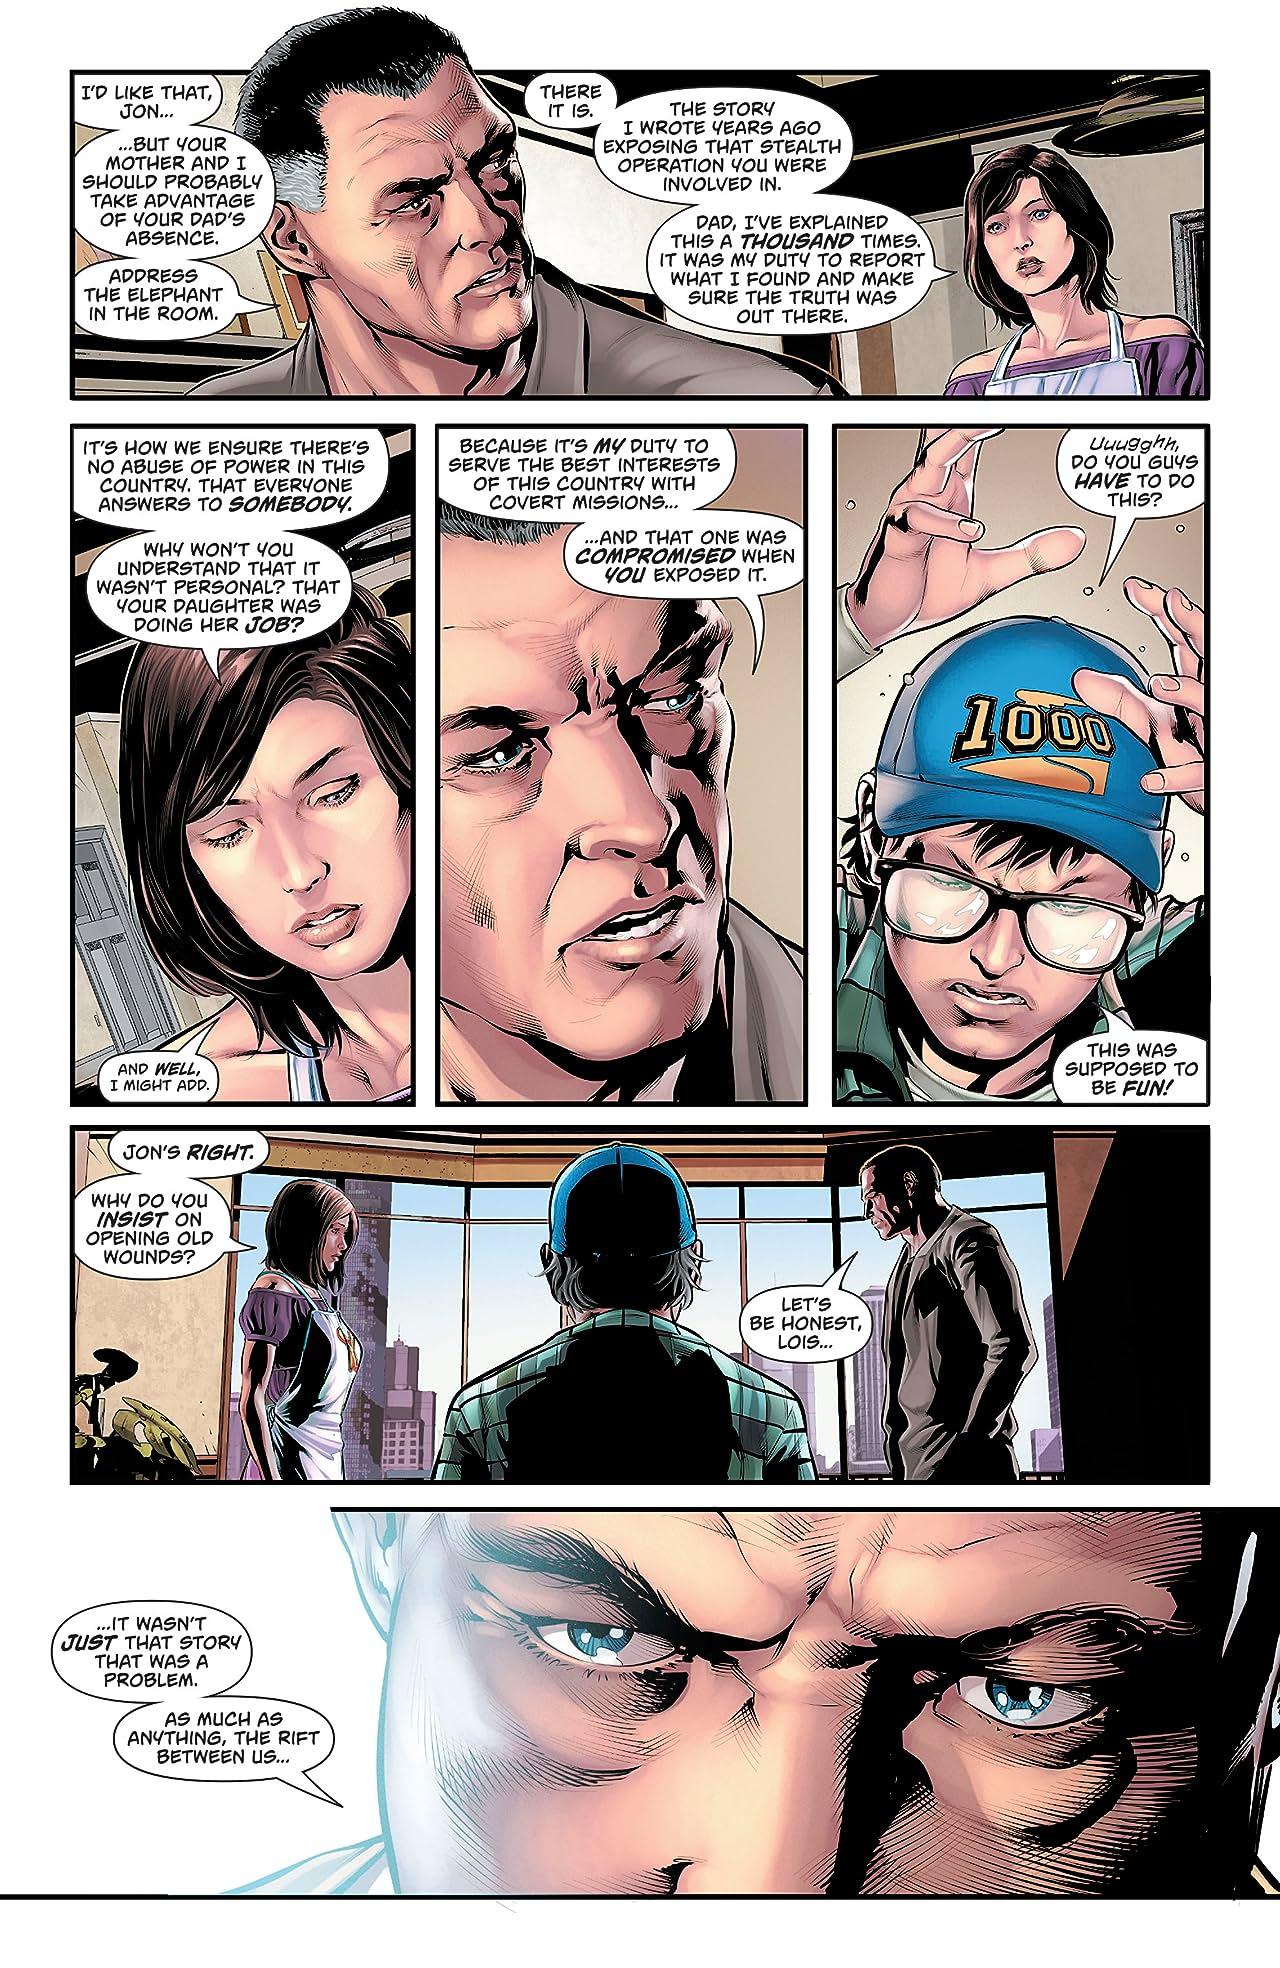 Action Comics (2016-) #999